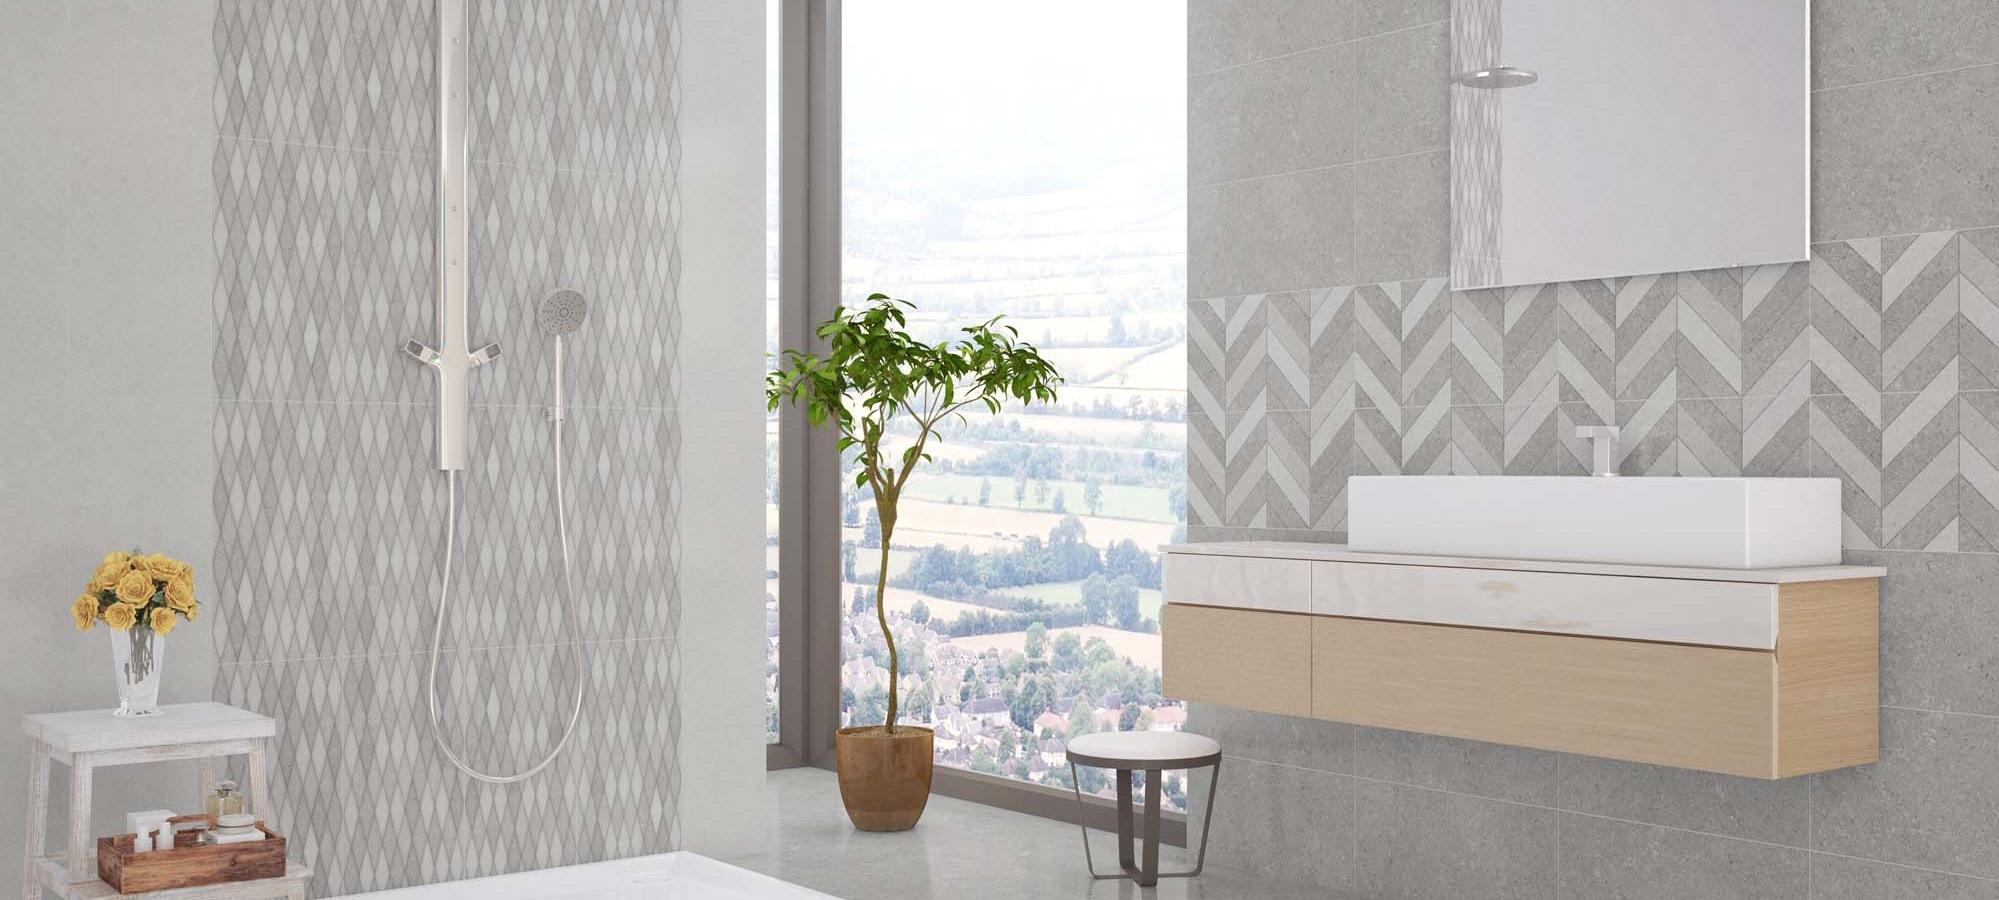 <span style='text-shadow: 0px 0px 8px black;'>Palazzo - decoruri atractive pentru băi moderne.</span>